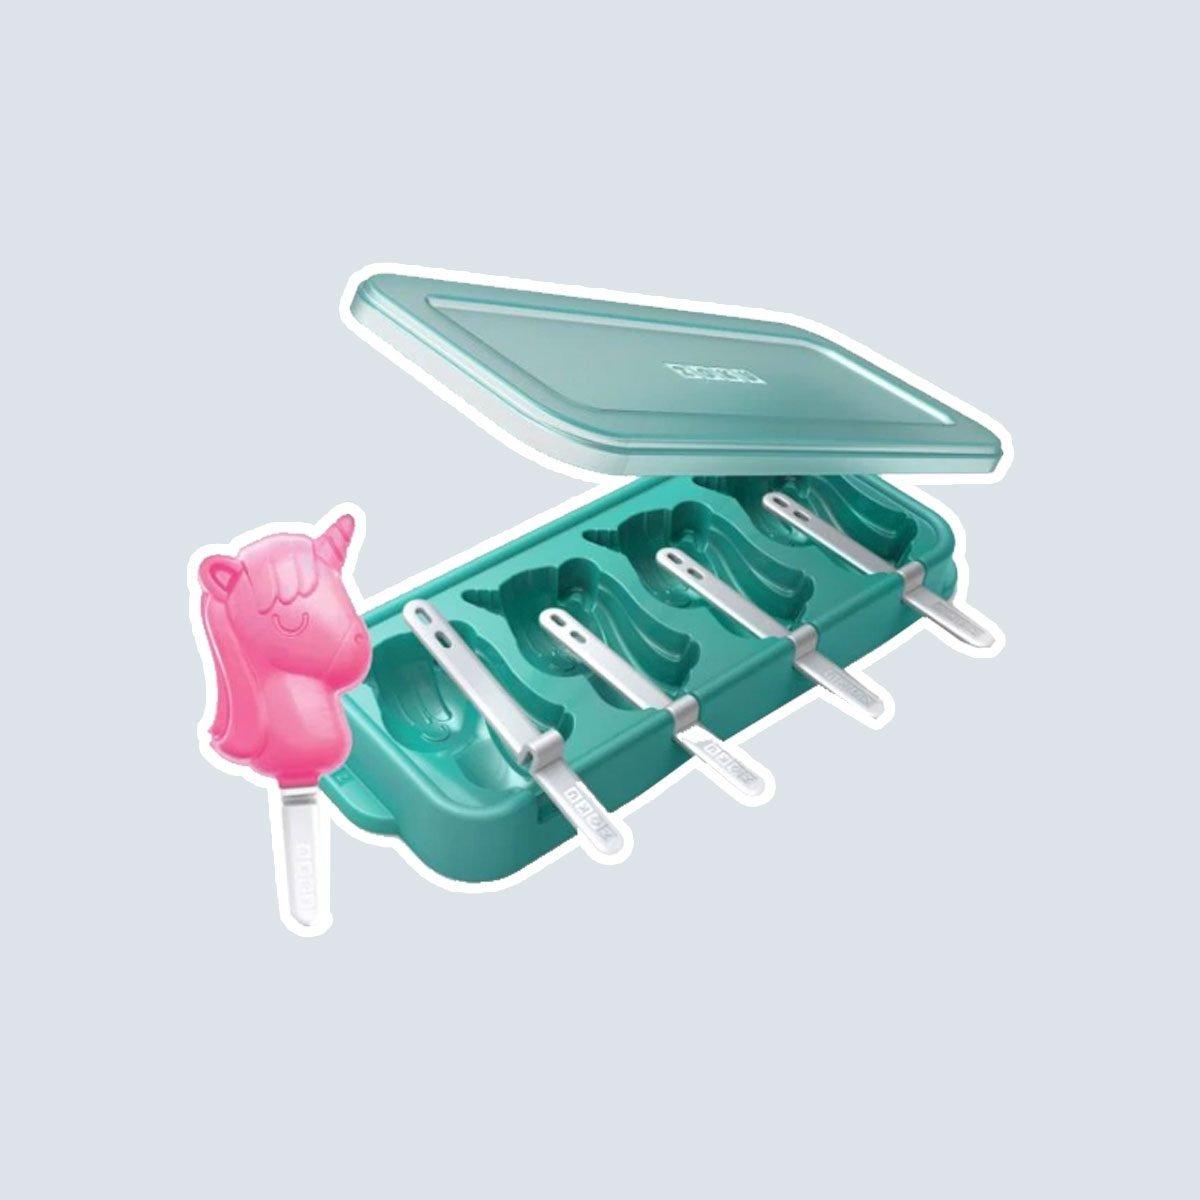 Zoku® Unicorn Ice Pop Molds in Blue (Set of 4)